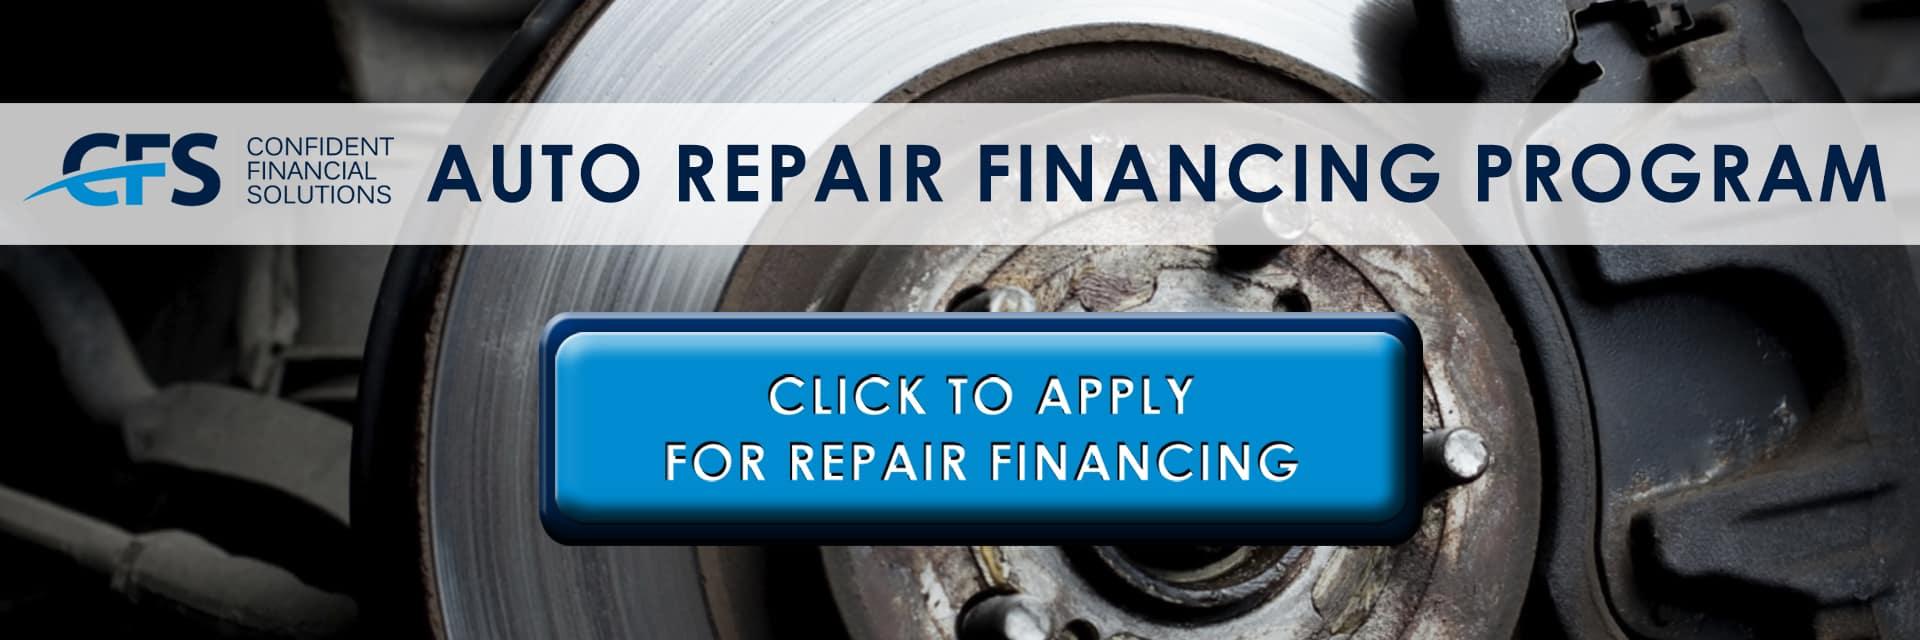 McGrathAcura-RepairFinancingBanner-1920x640